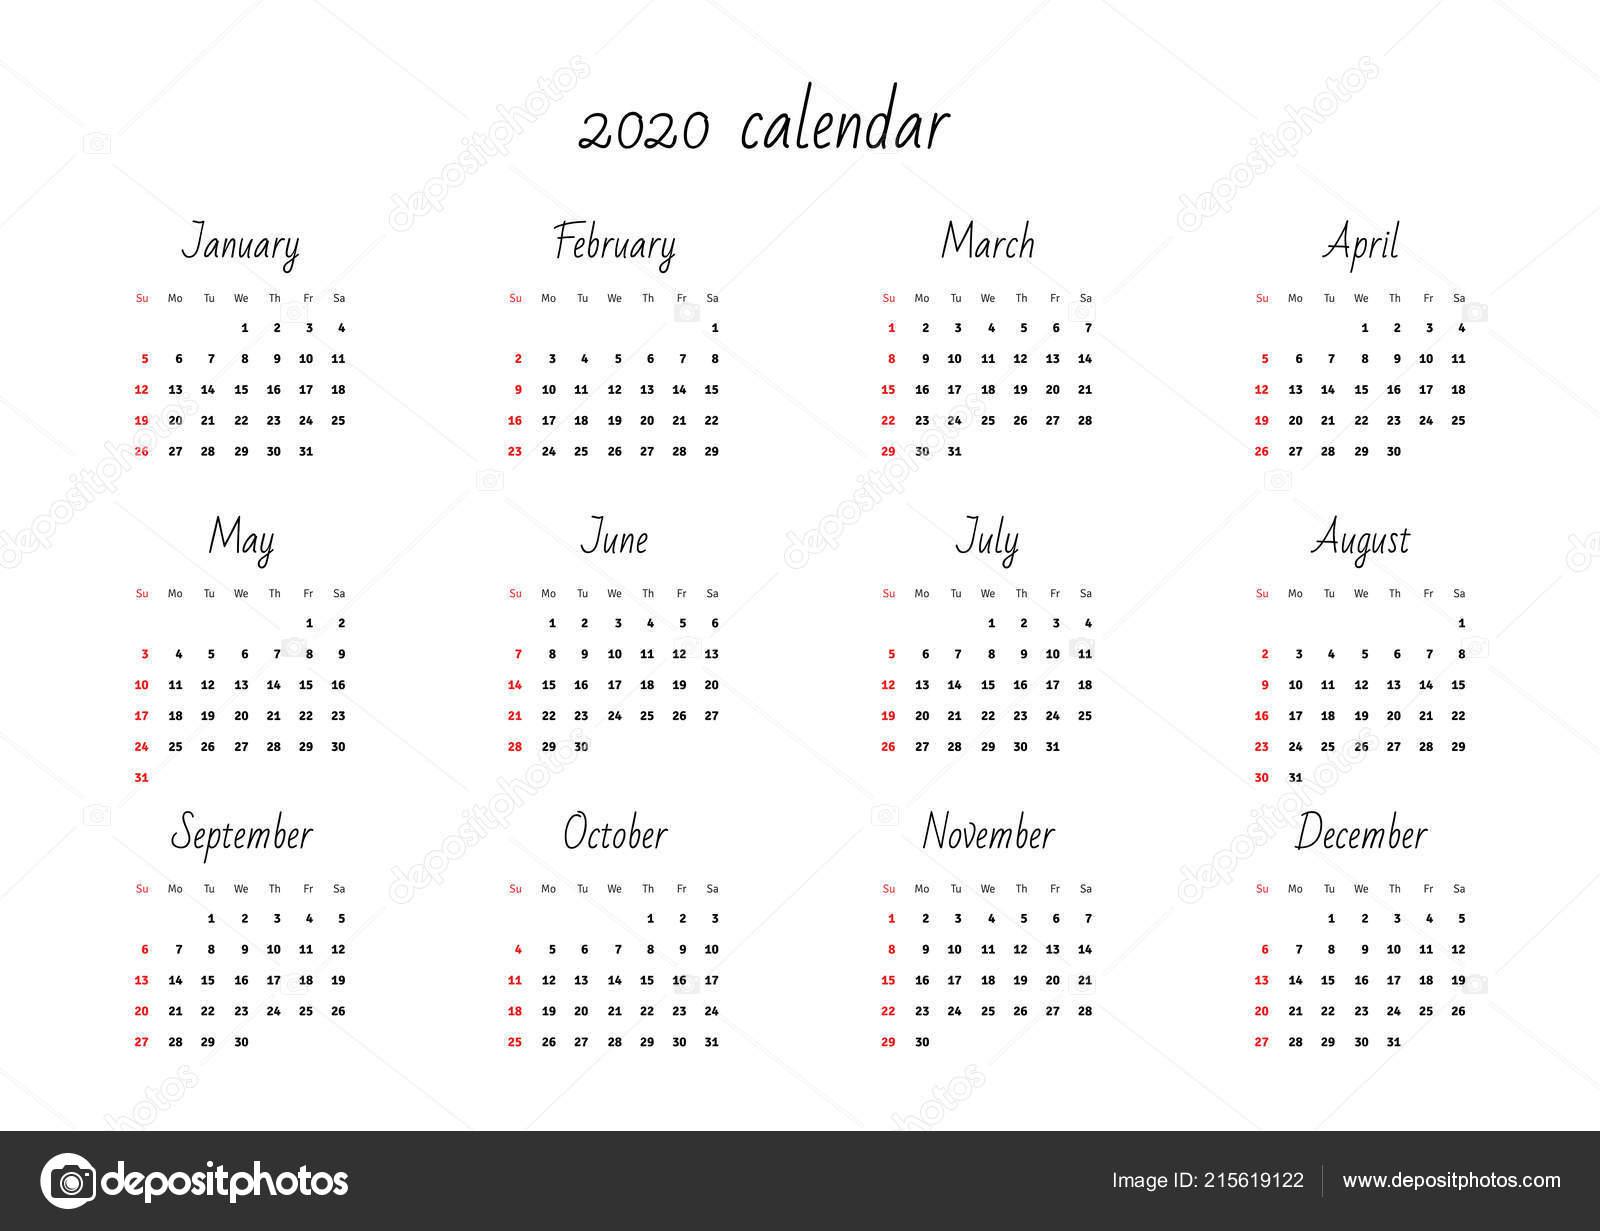 2020 Calendar Eps